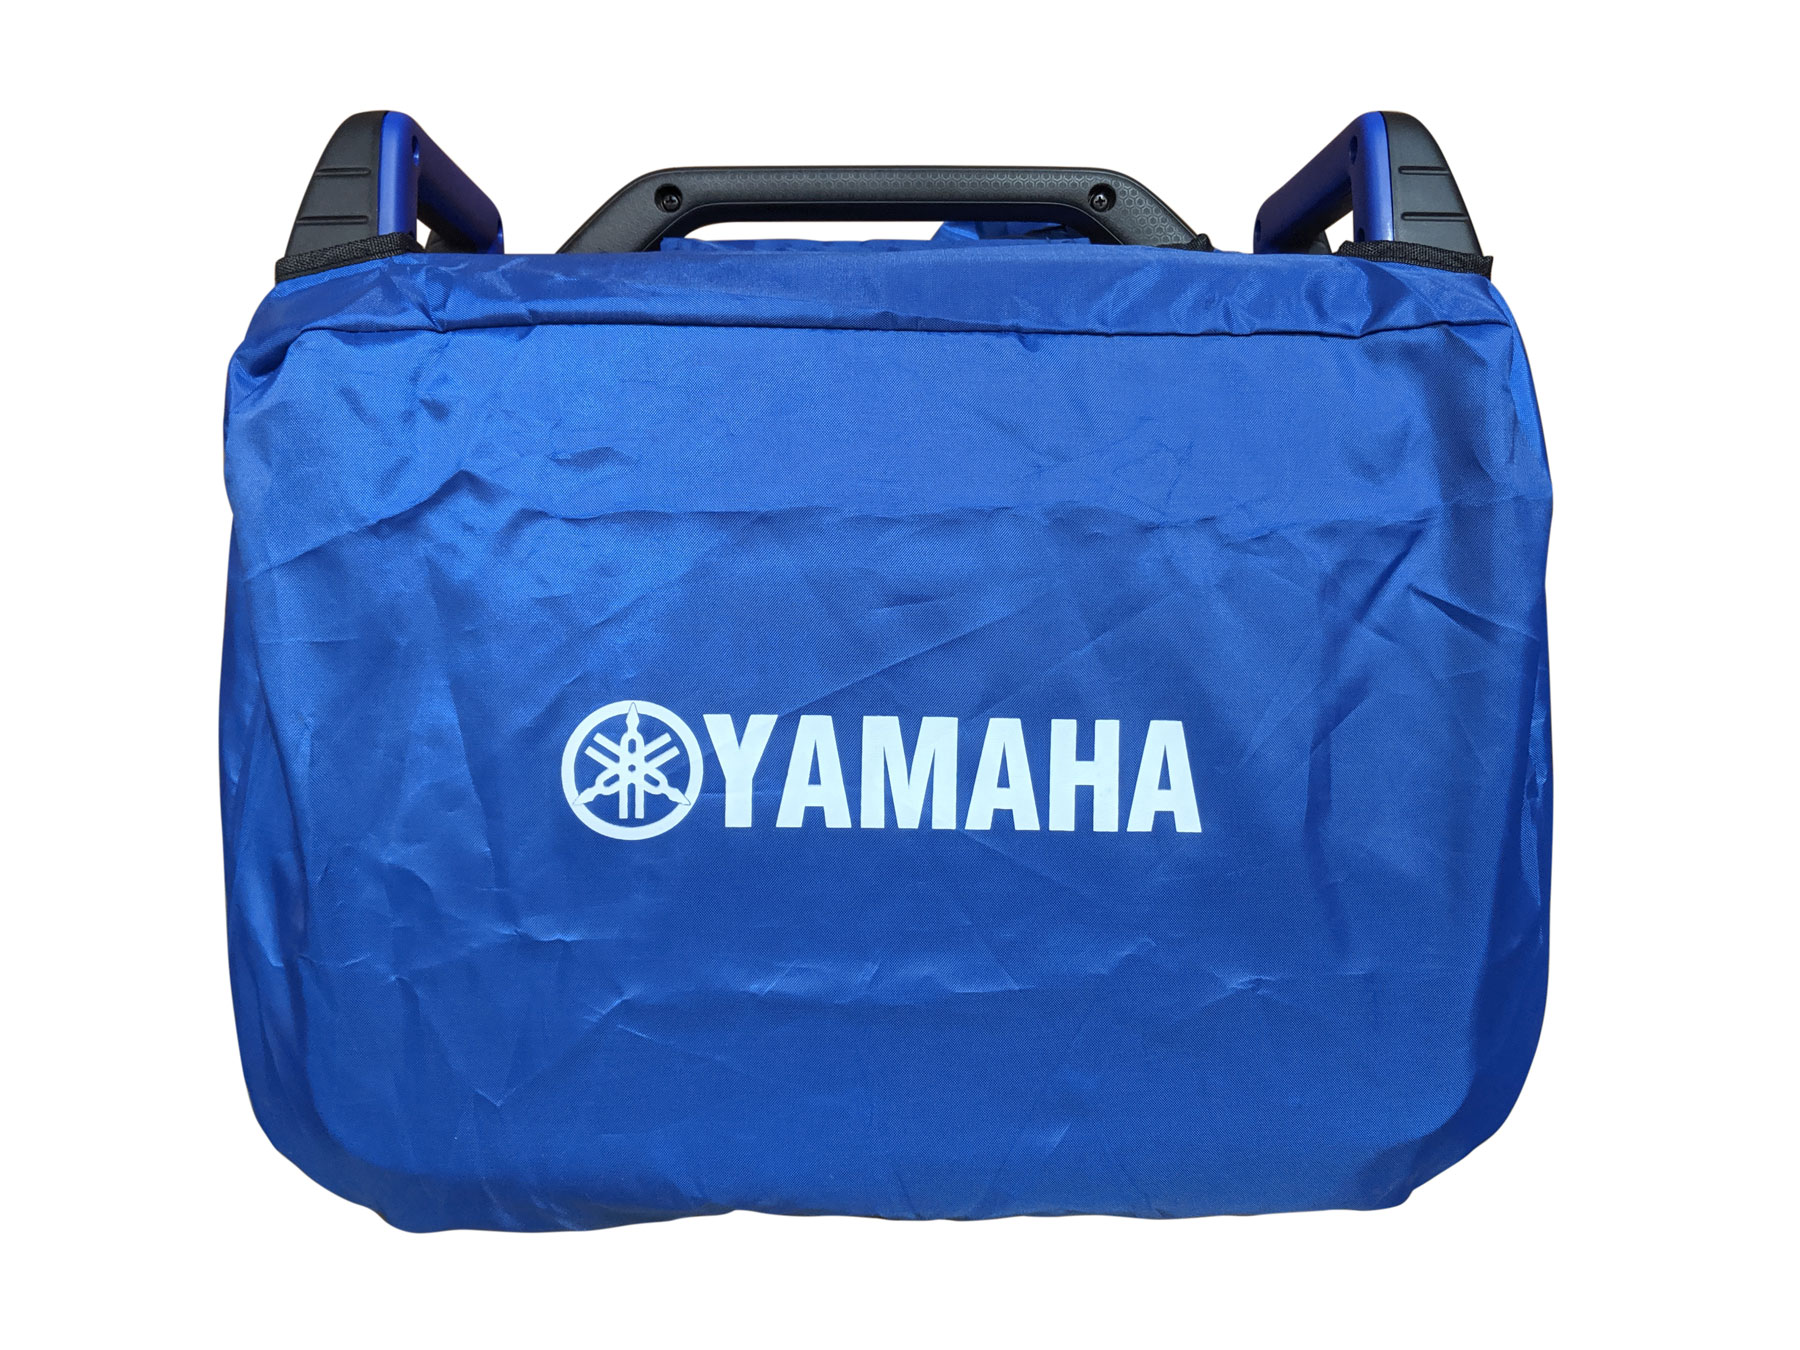 Yamaha 1Kva Generator Cover